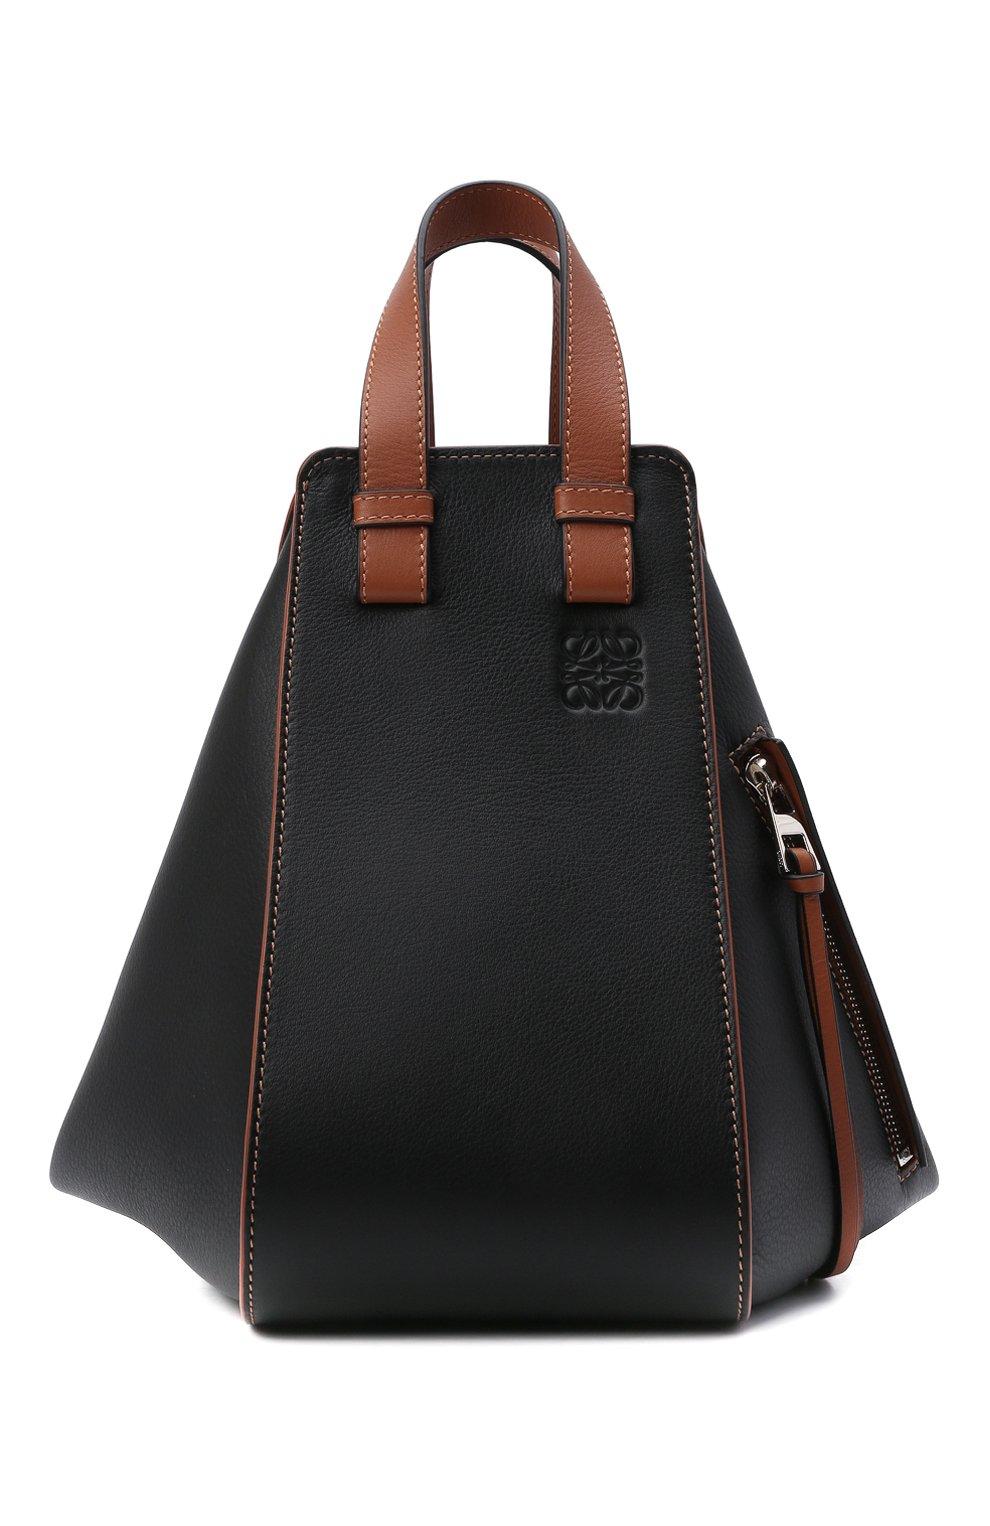 Женская сумка hammock small LOEWE черного цвета, арт. A538S35X04   Фото 1 (Сумки-технические: Сумки через плечо, Сумки top-handle; Материал: Натуральная кожа; Ремень/цепочка: На ремешке; Размер: small)